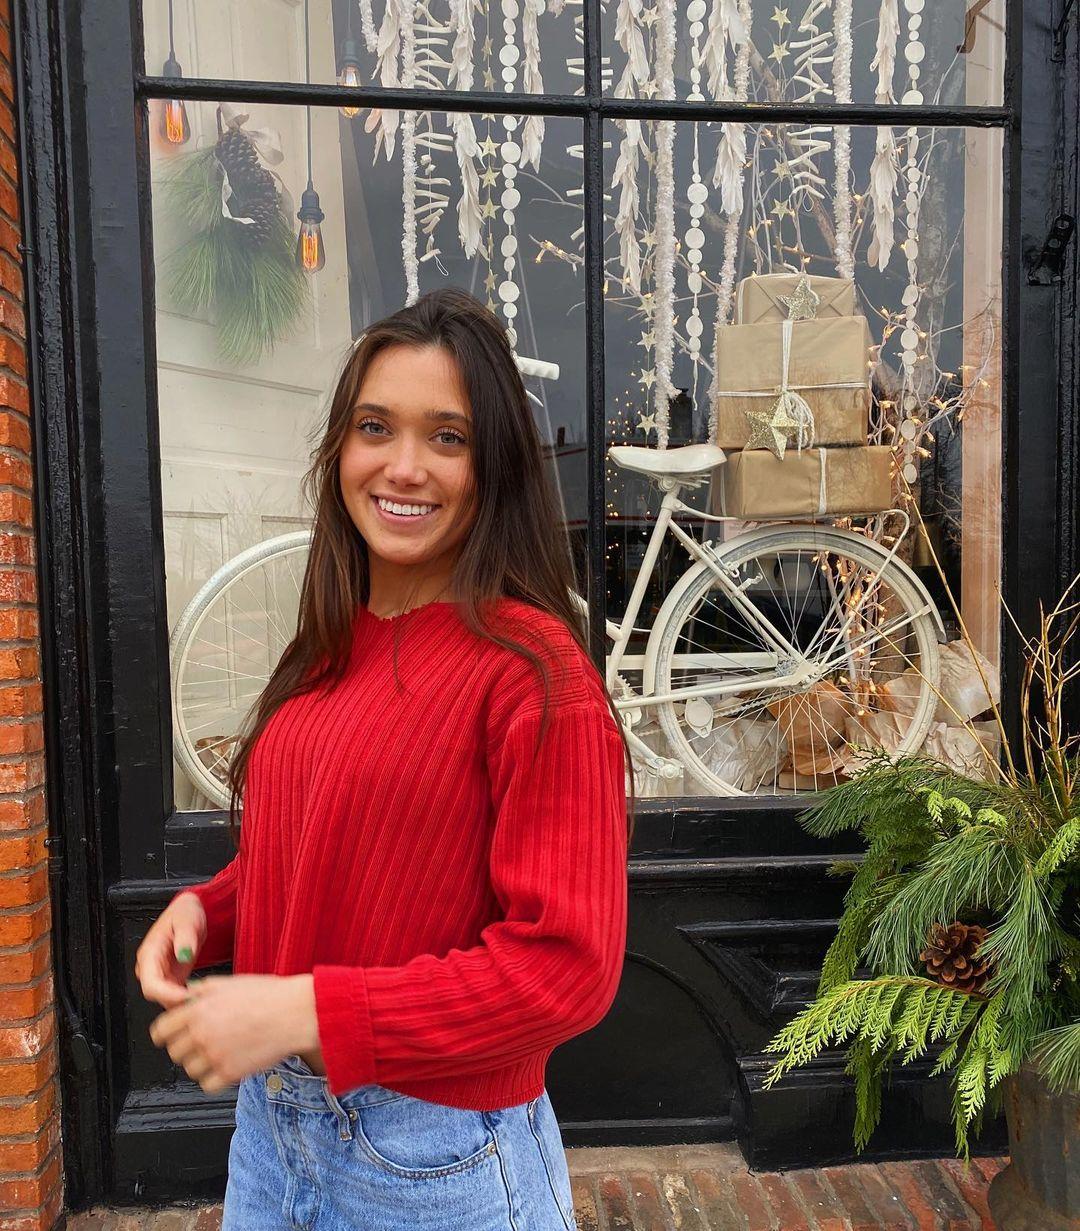 Hannah-Meloche-Wallpapers-Insta-Fit-Bio-1